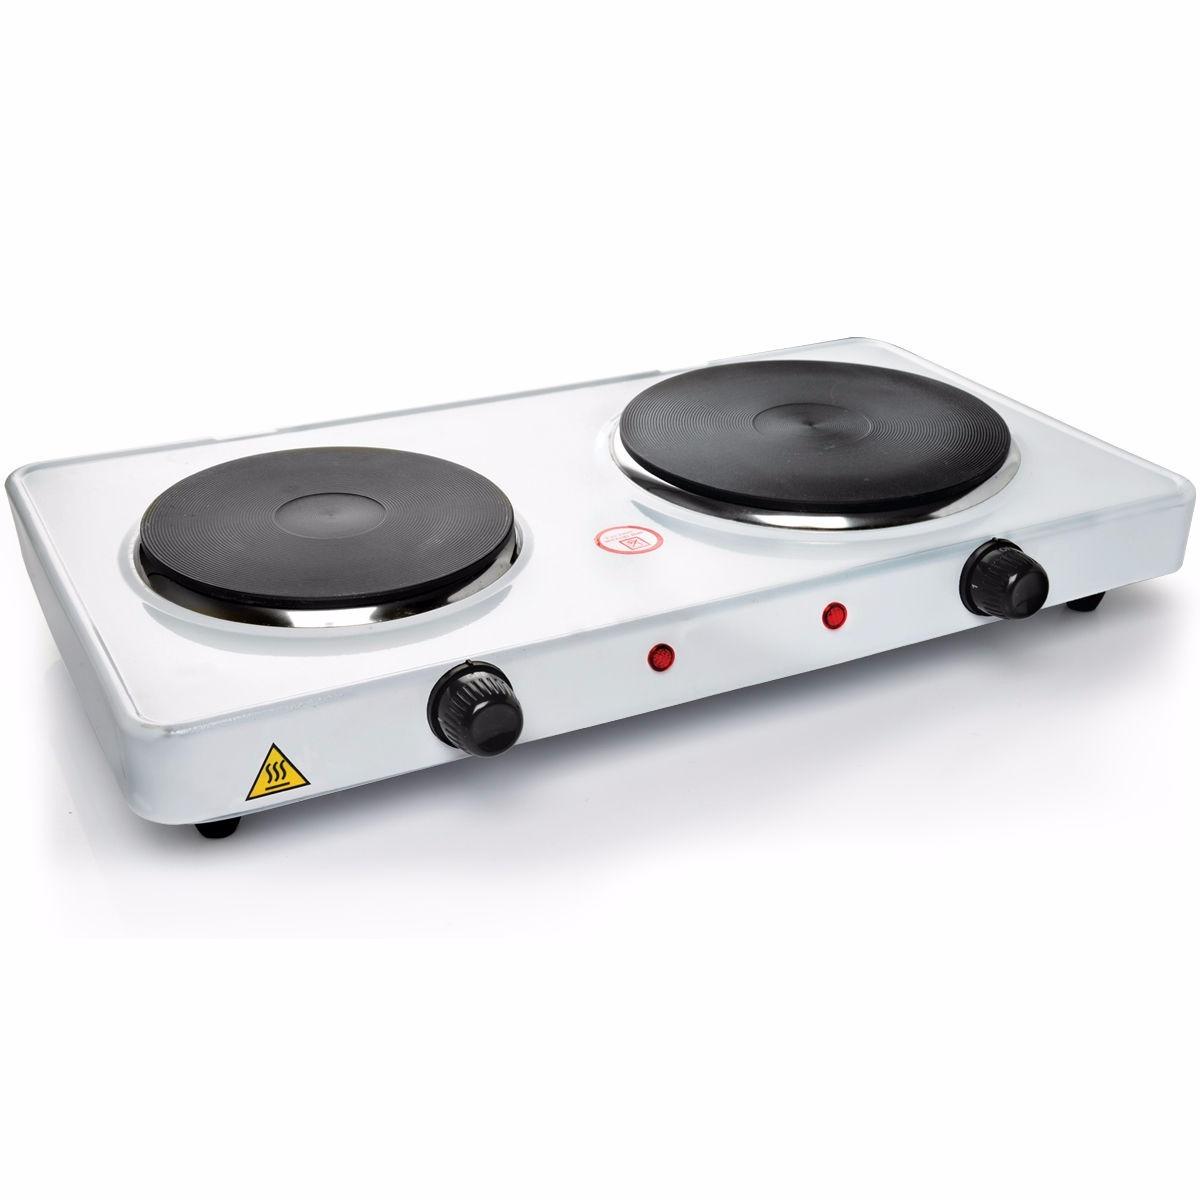 cocina encimera 2 plato electrica 2000w portatil